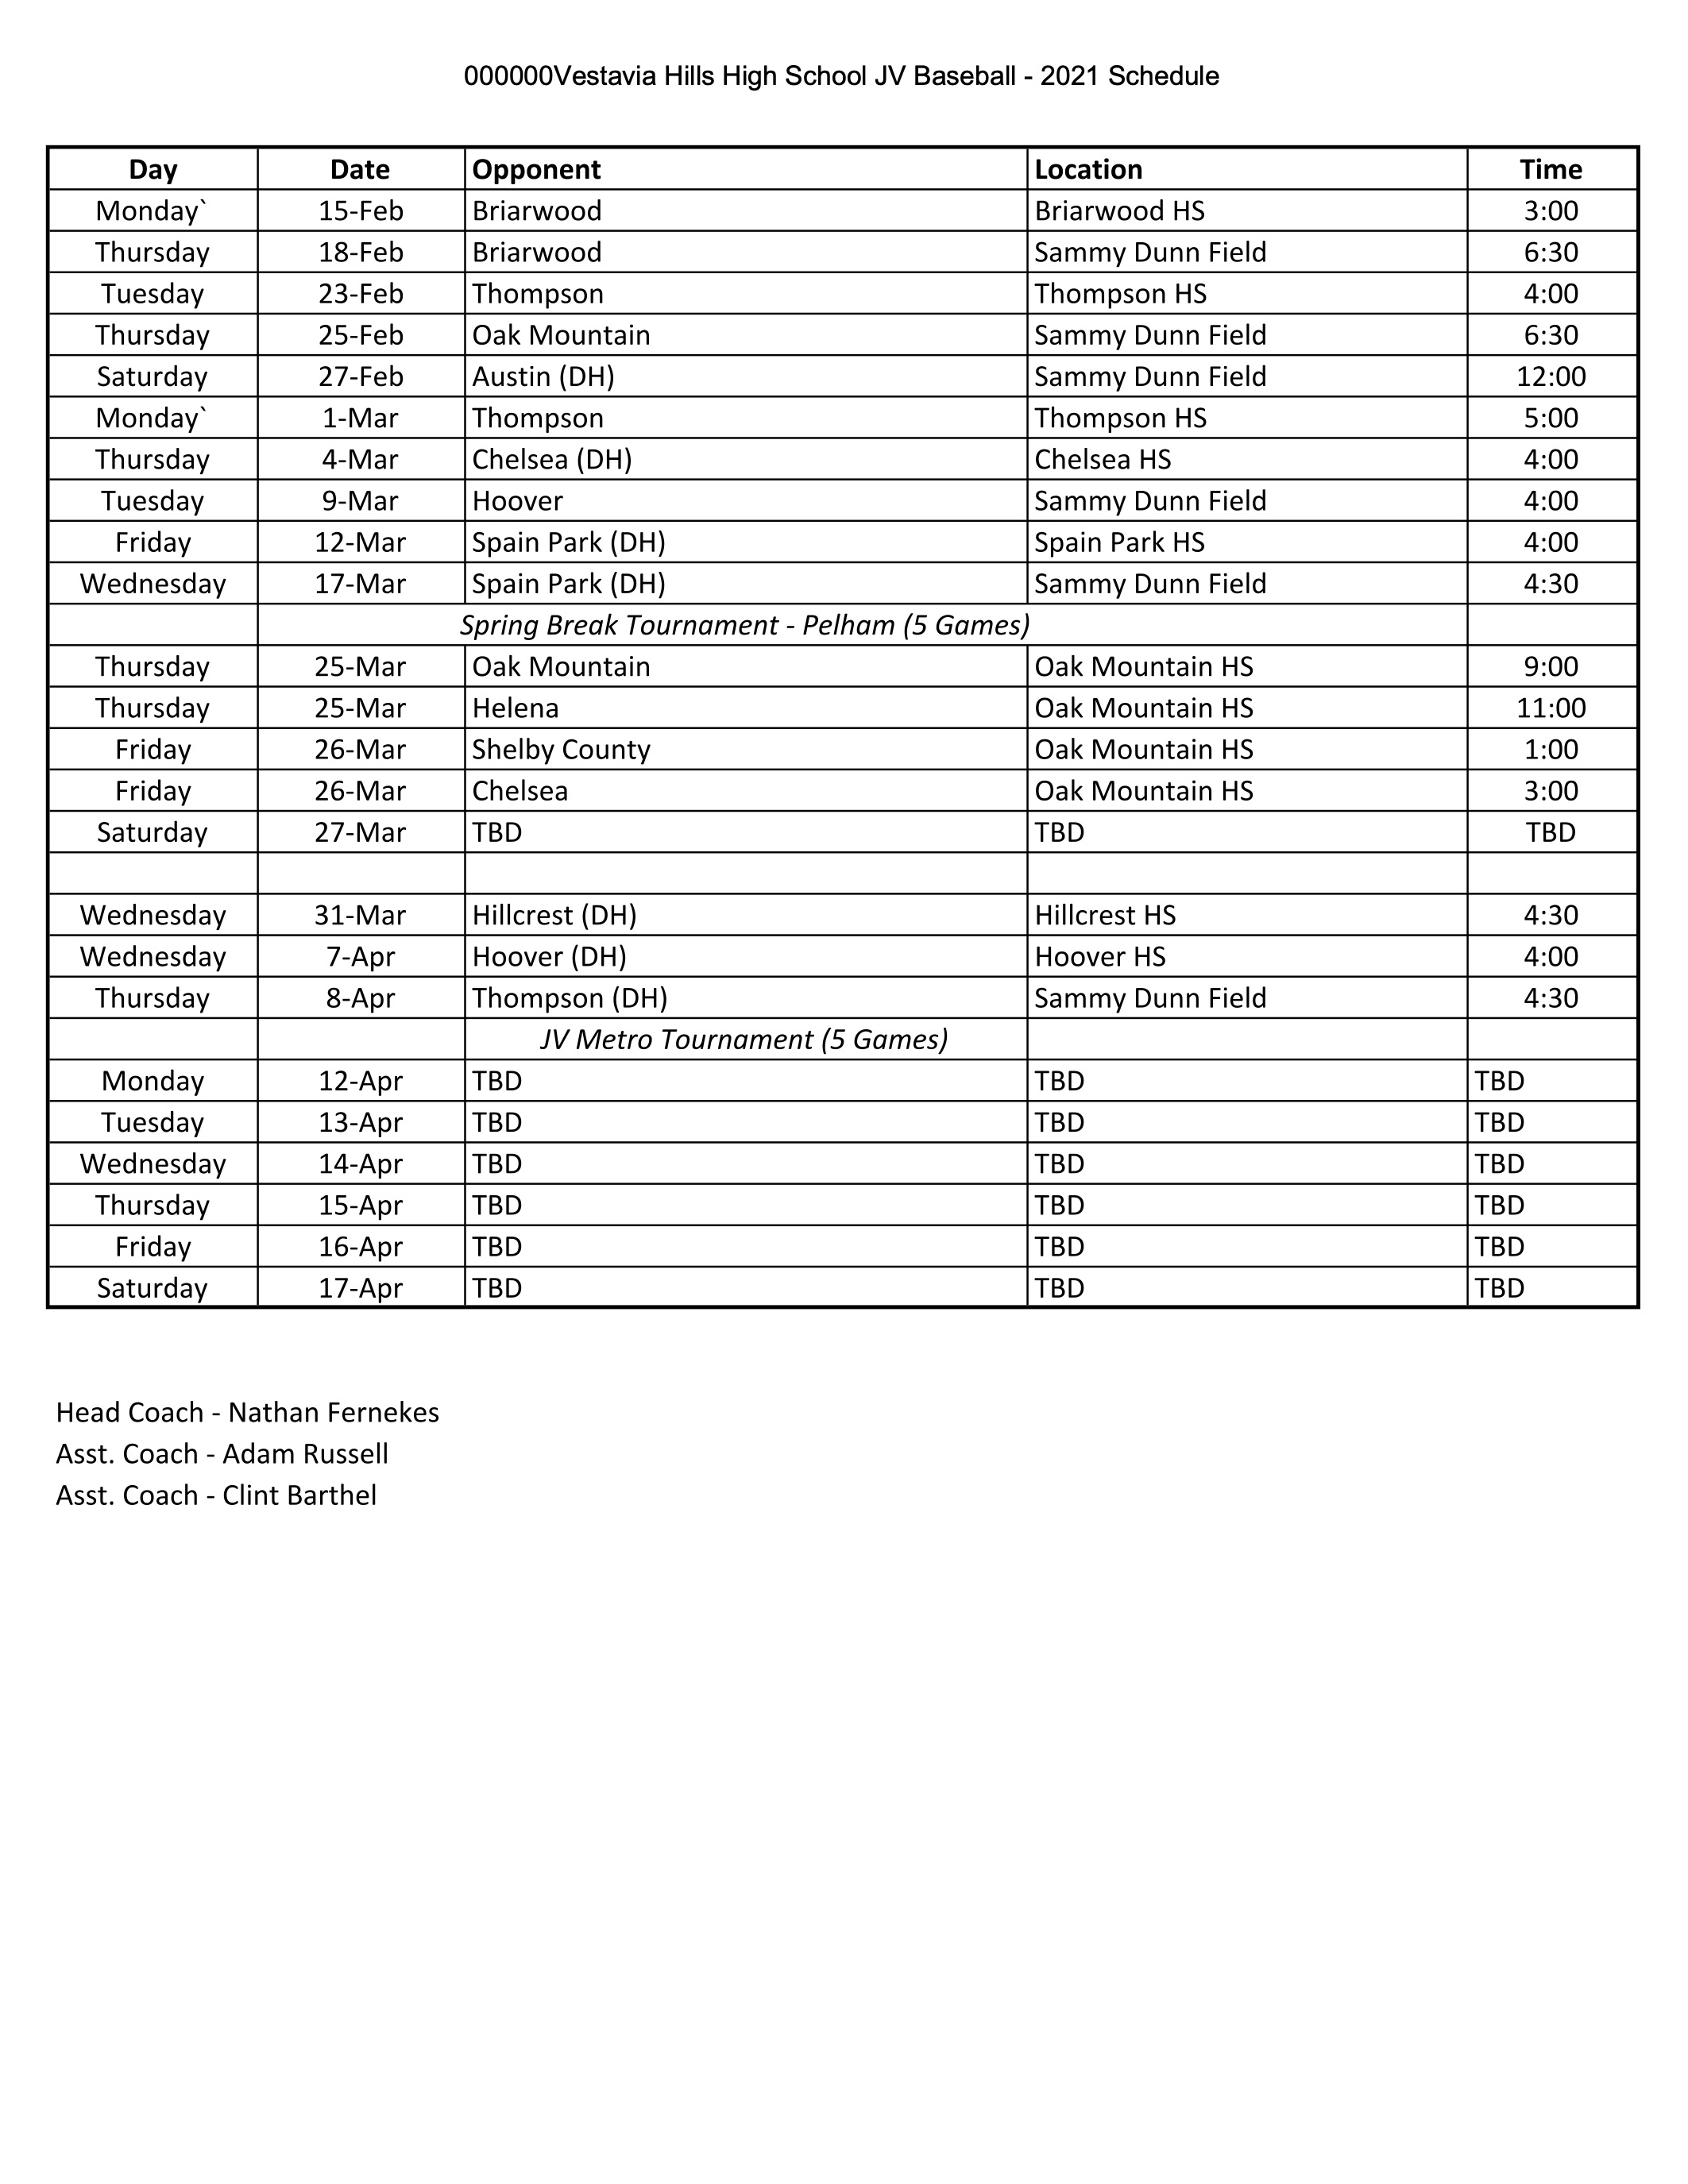 2021 JV Baseball Schedule